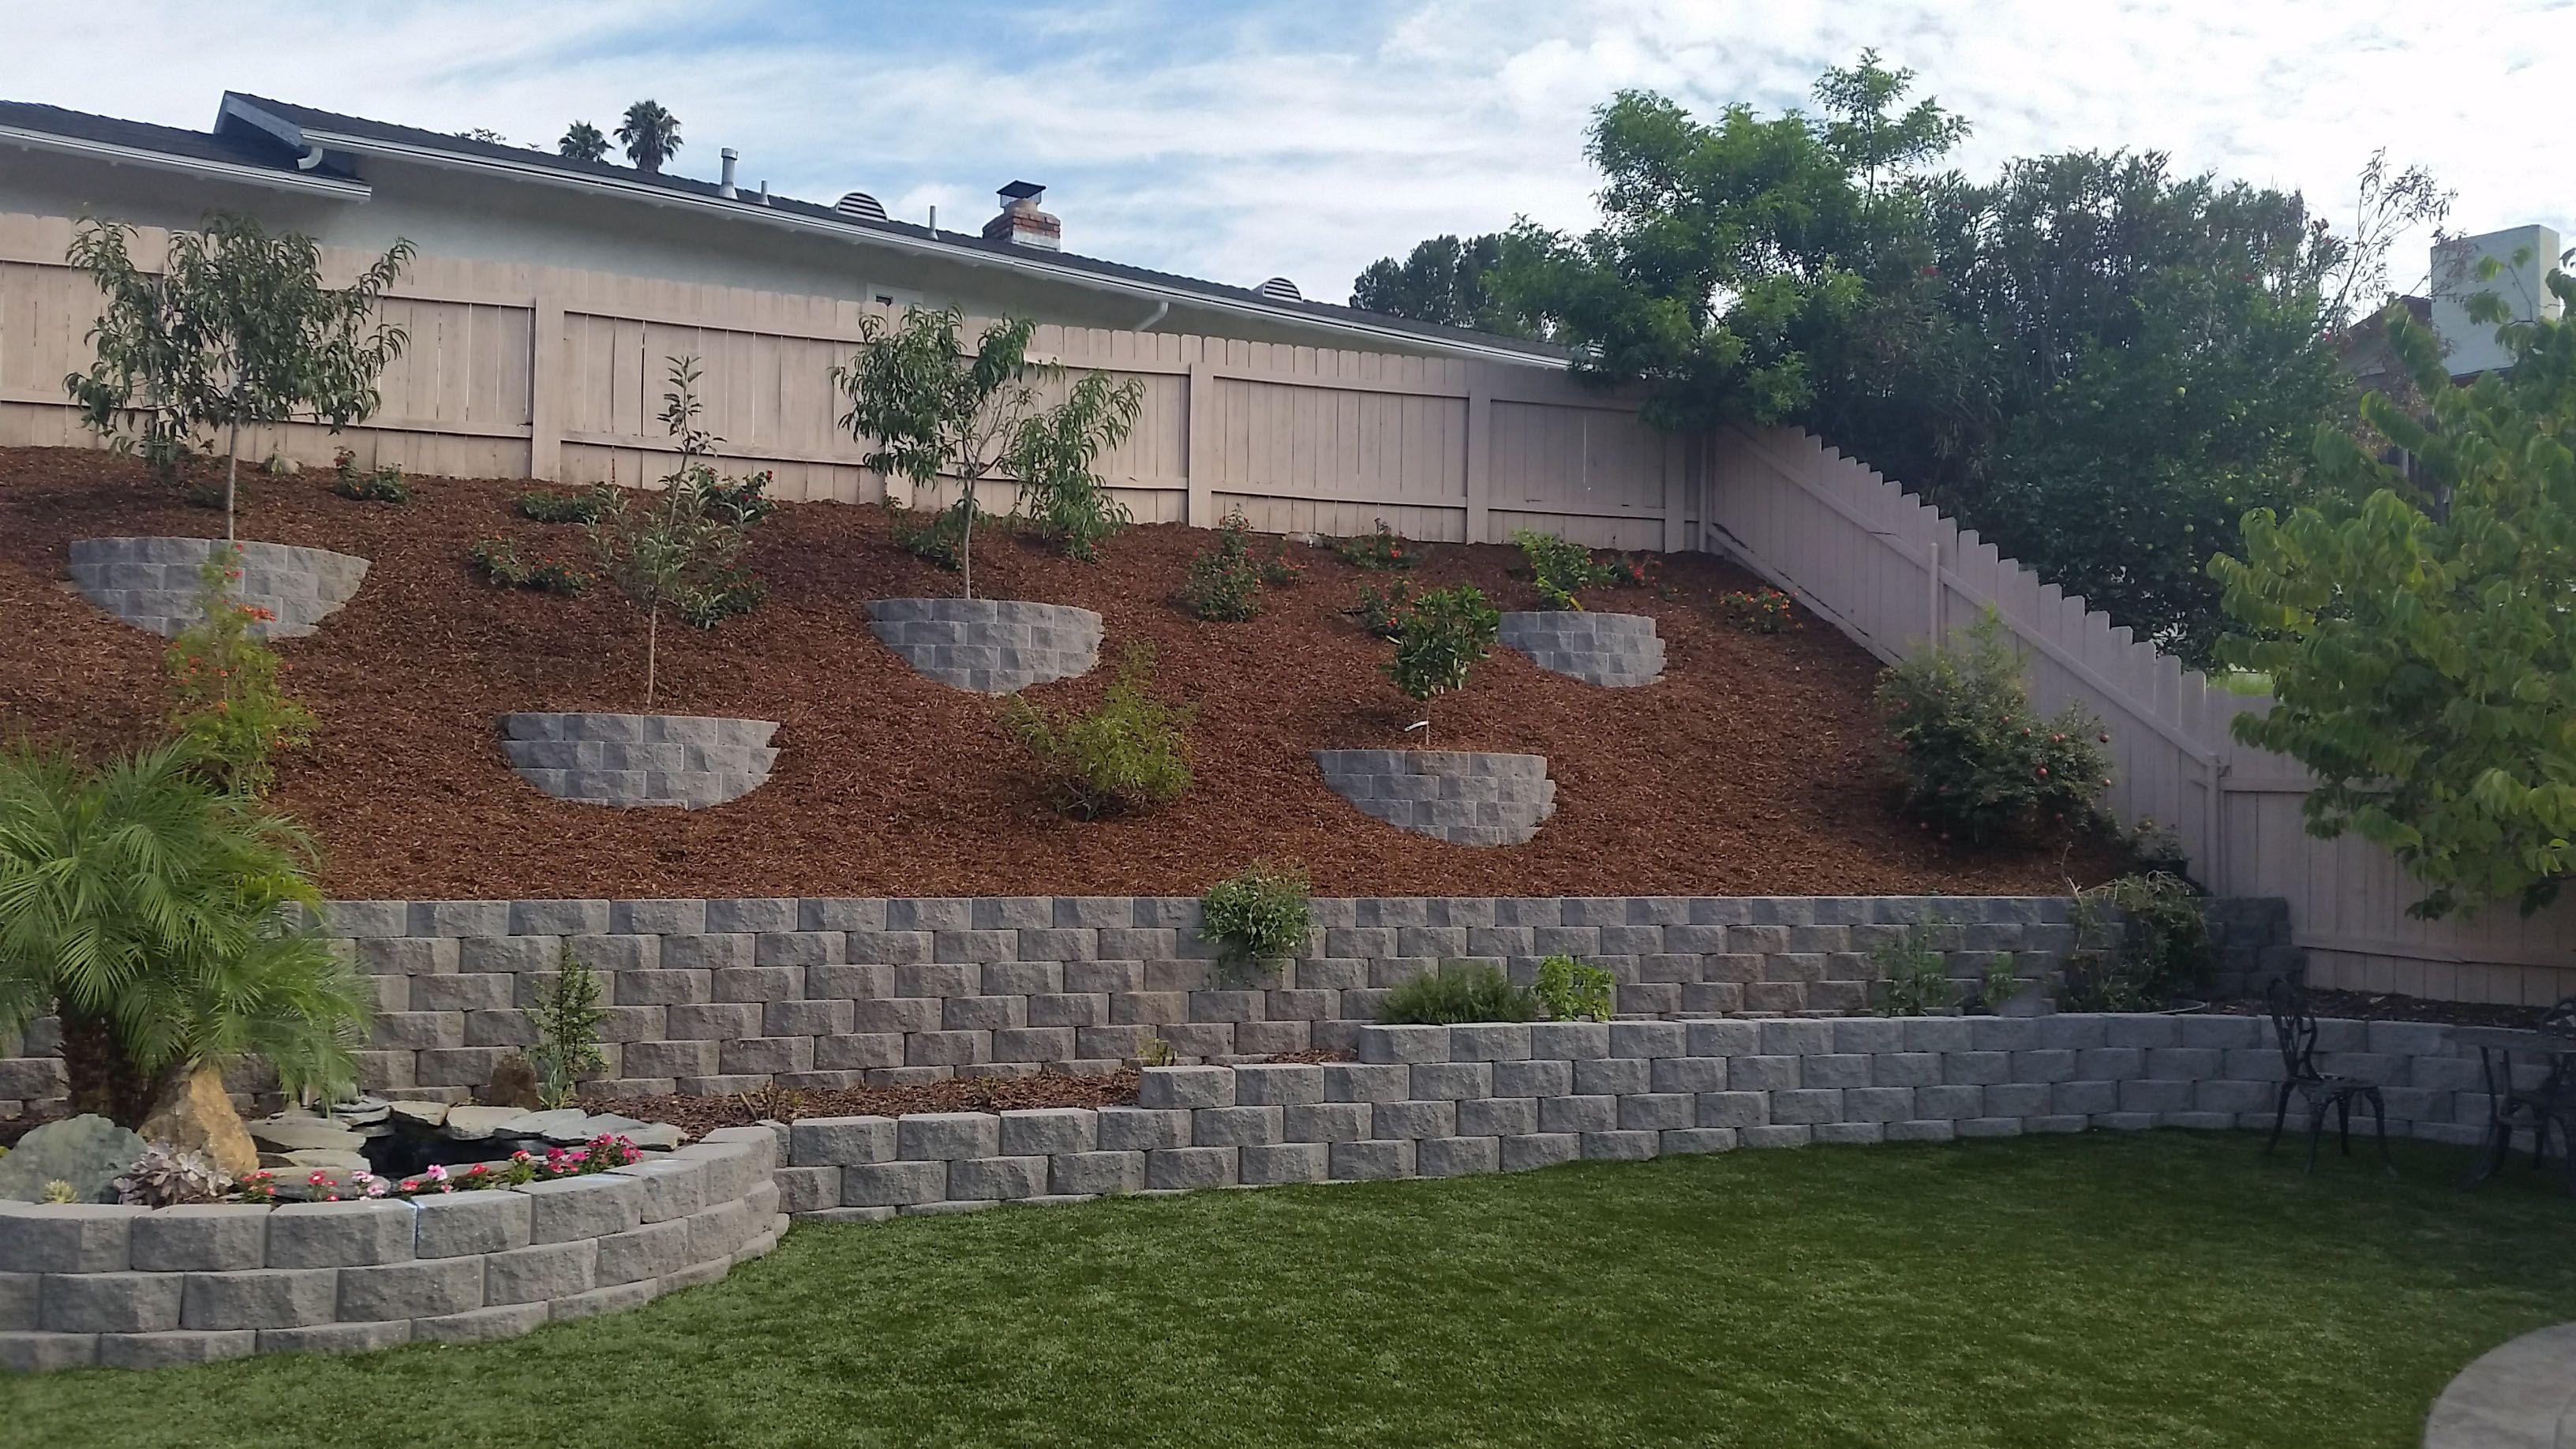 Retaining Walls Artificial Turf Turf Outdoor Decor